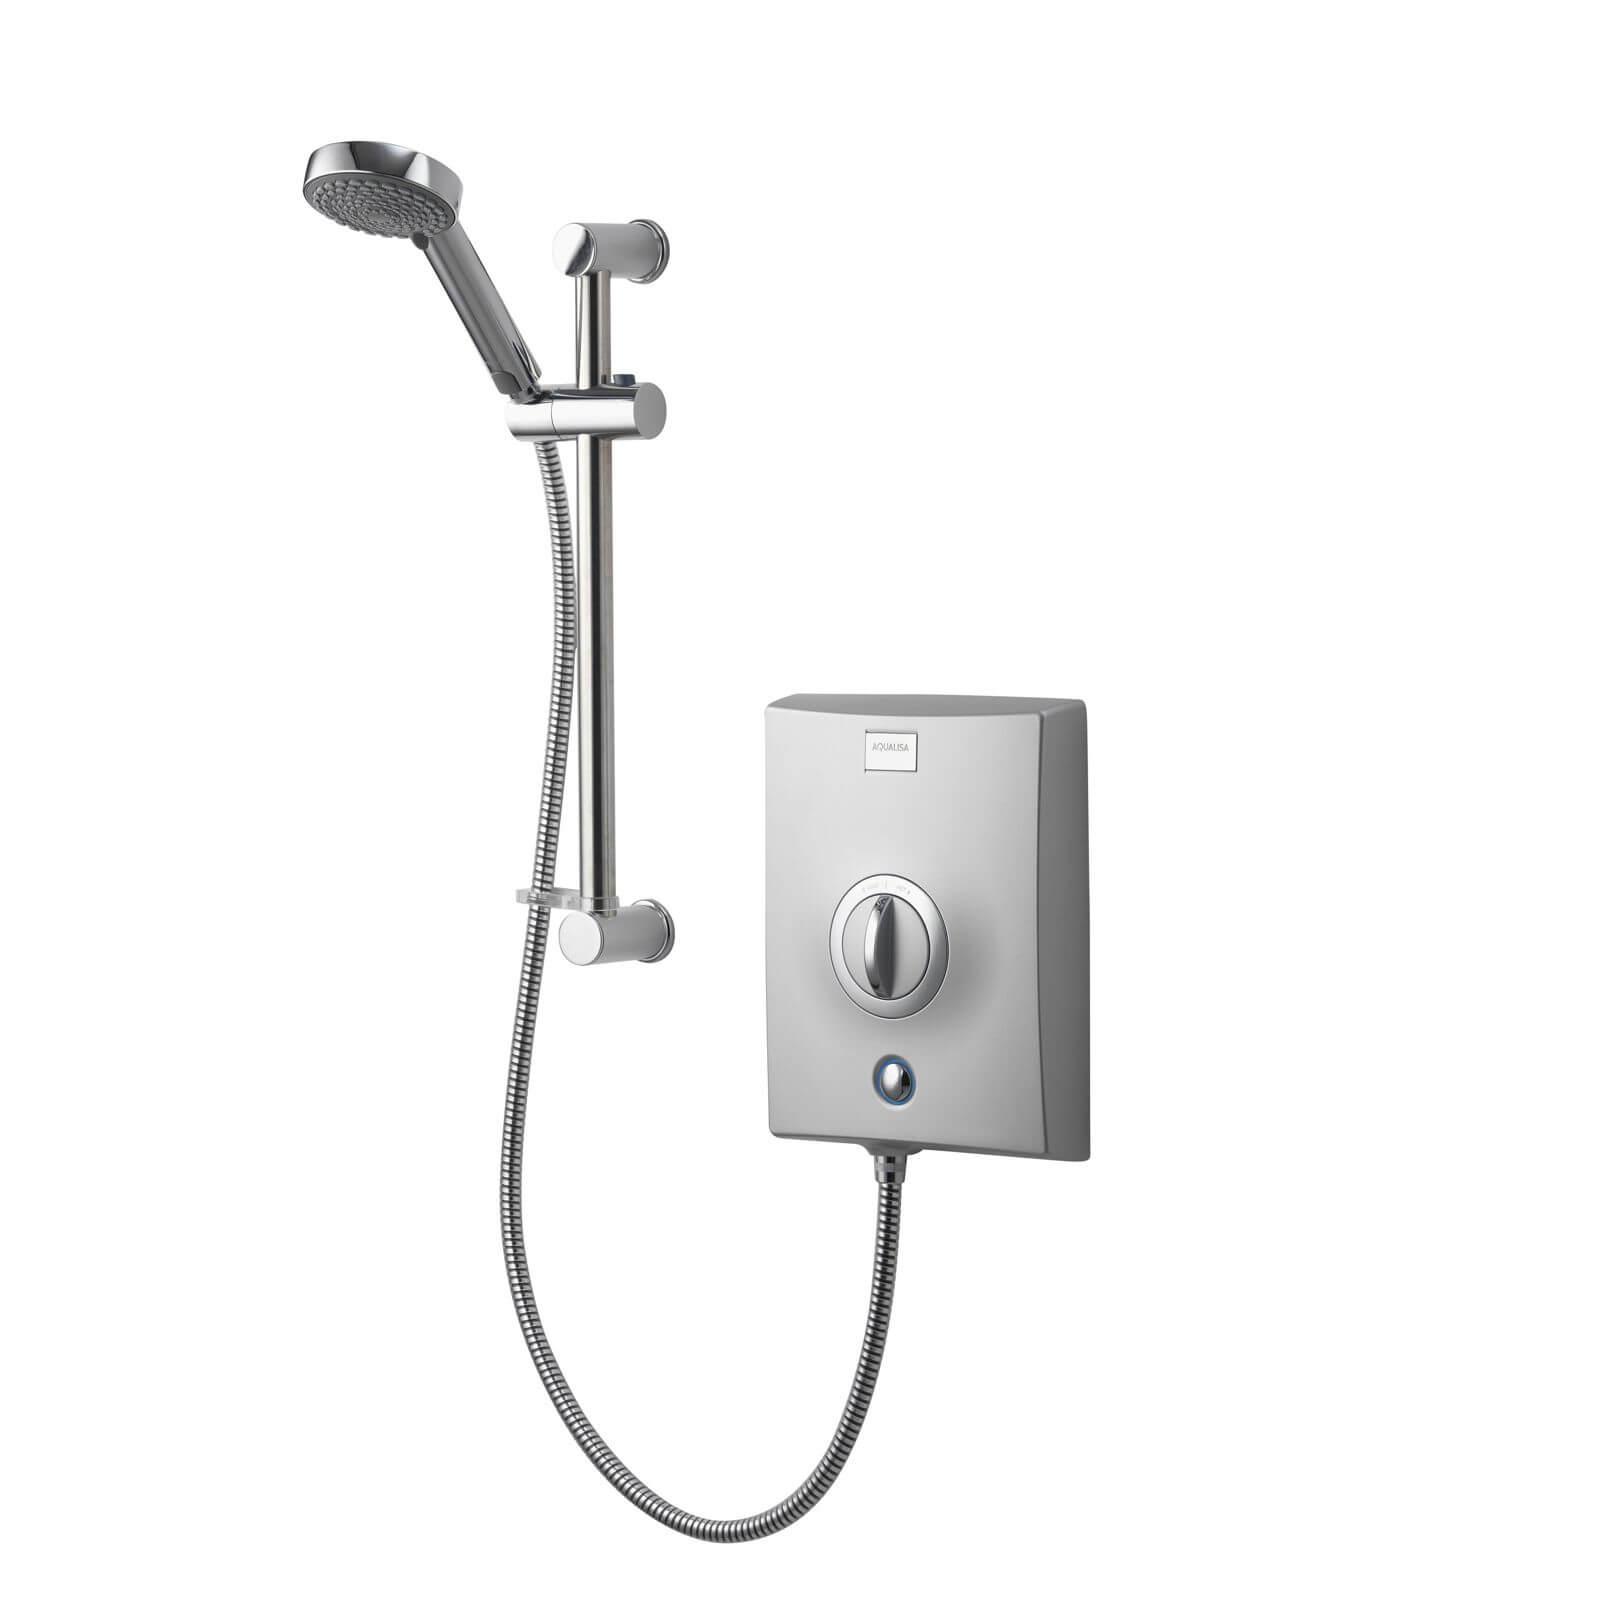 Aqualisa Quartz 9.5kW Electric Shower - Chrome